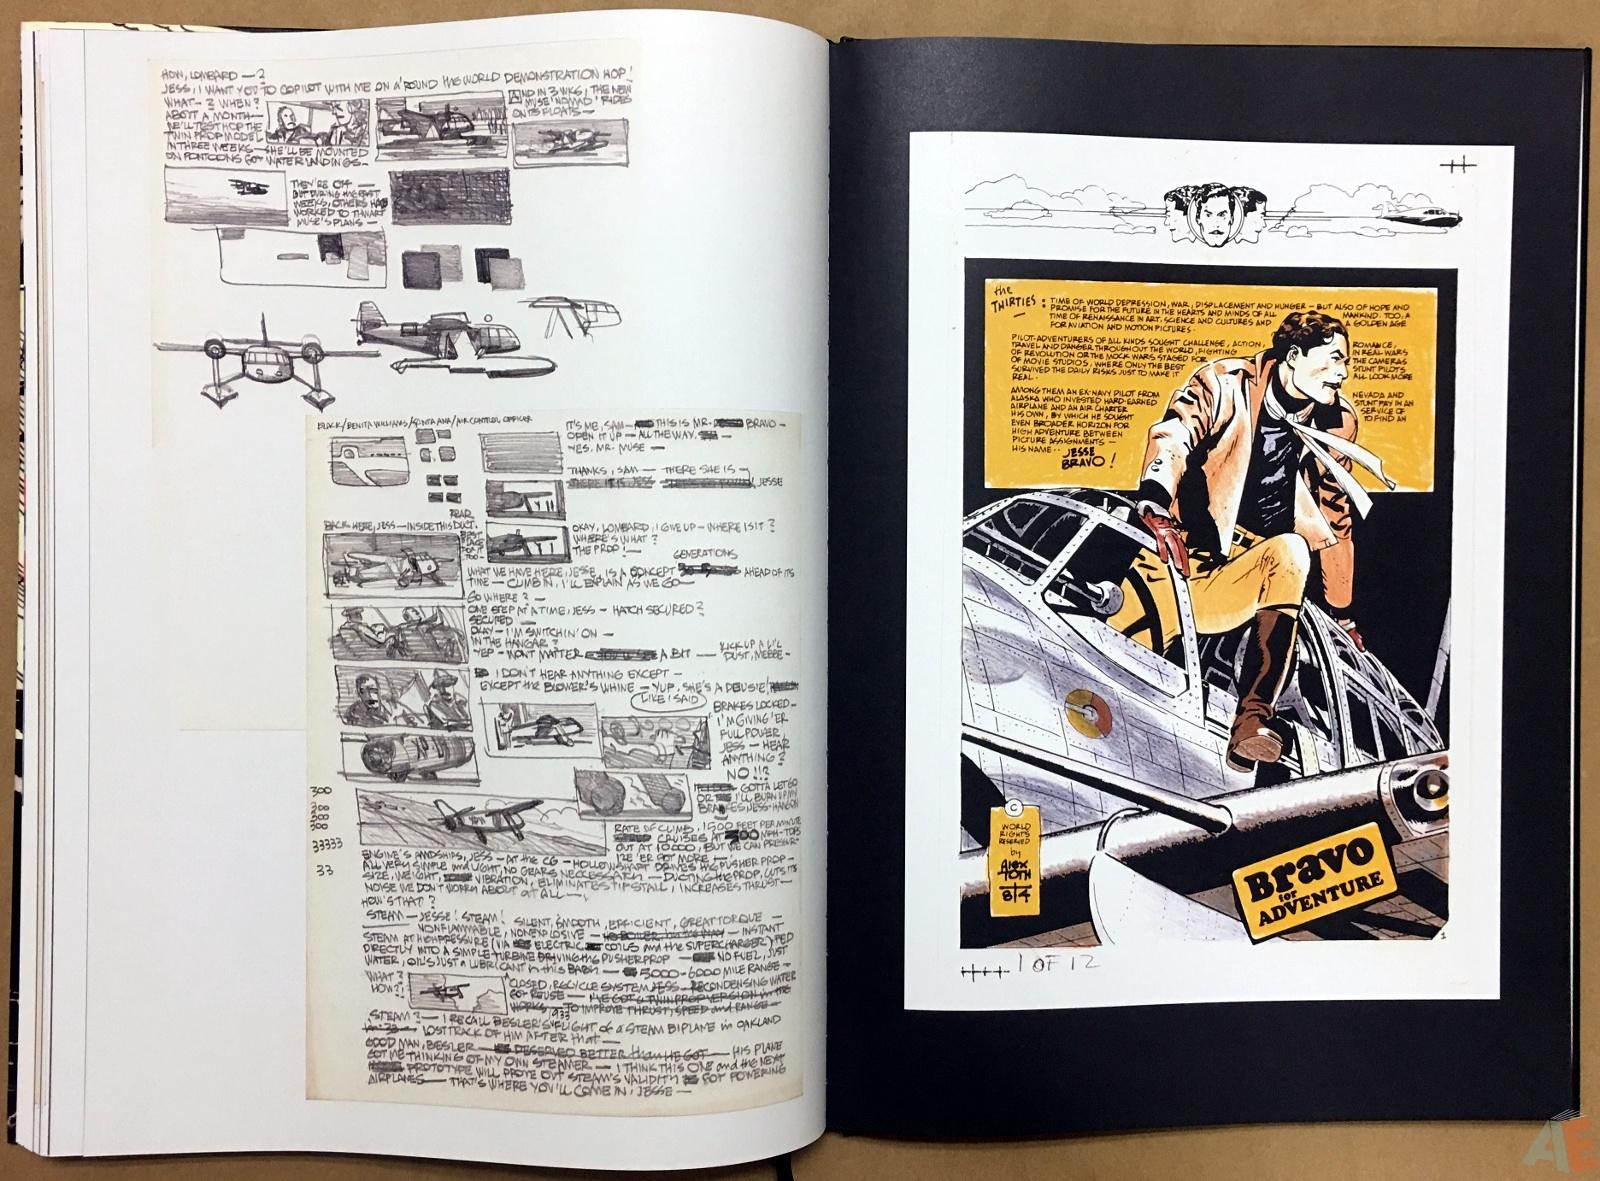 Alex Toth's Bravo For Adventure Artist's Edition 34